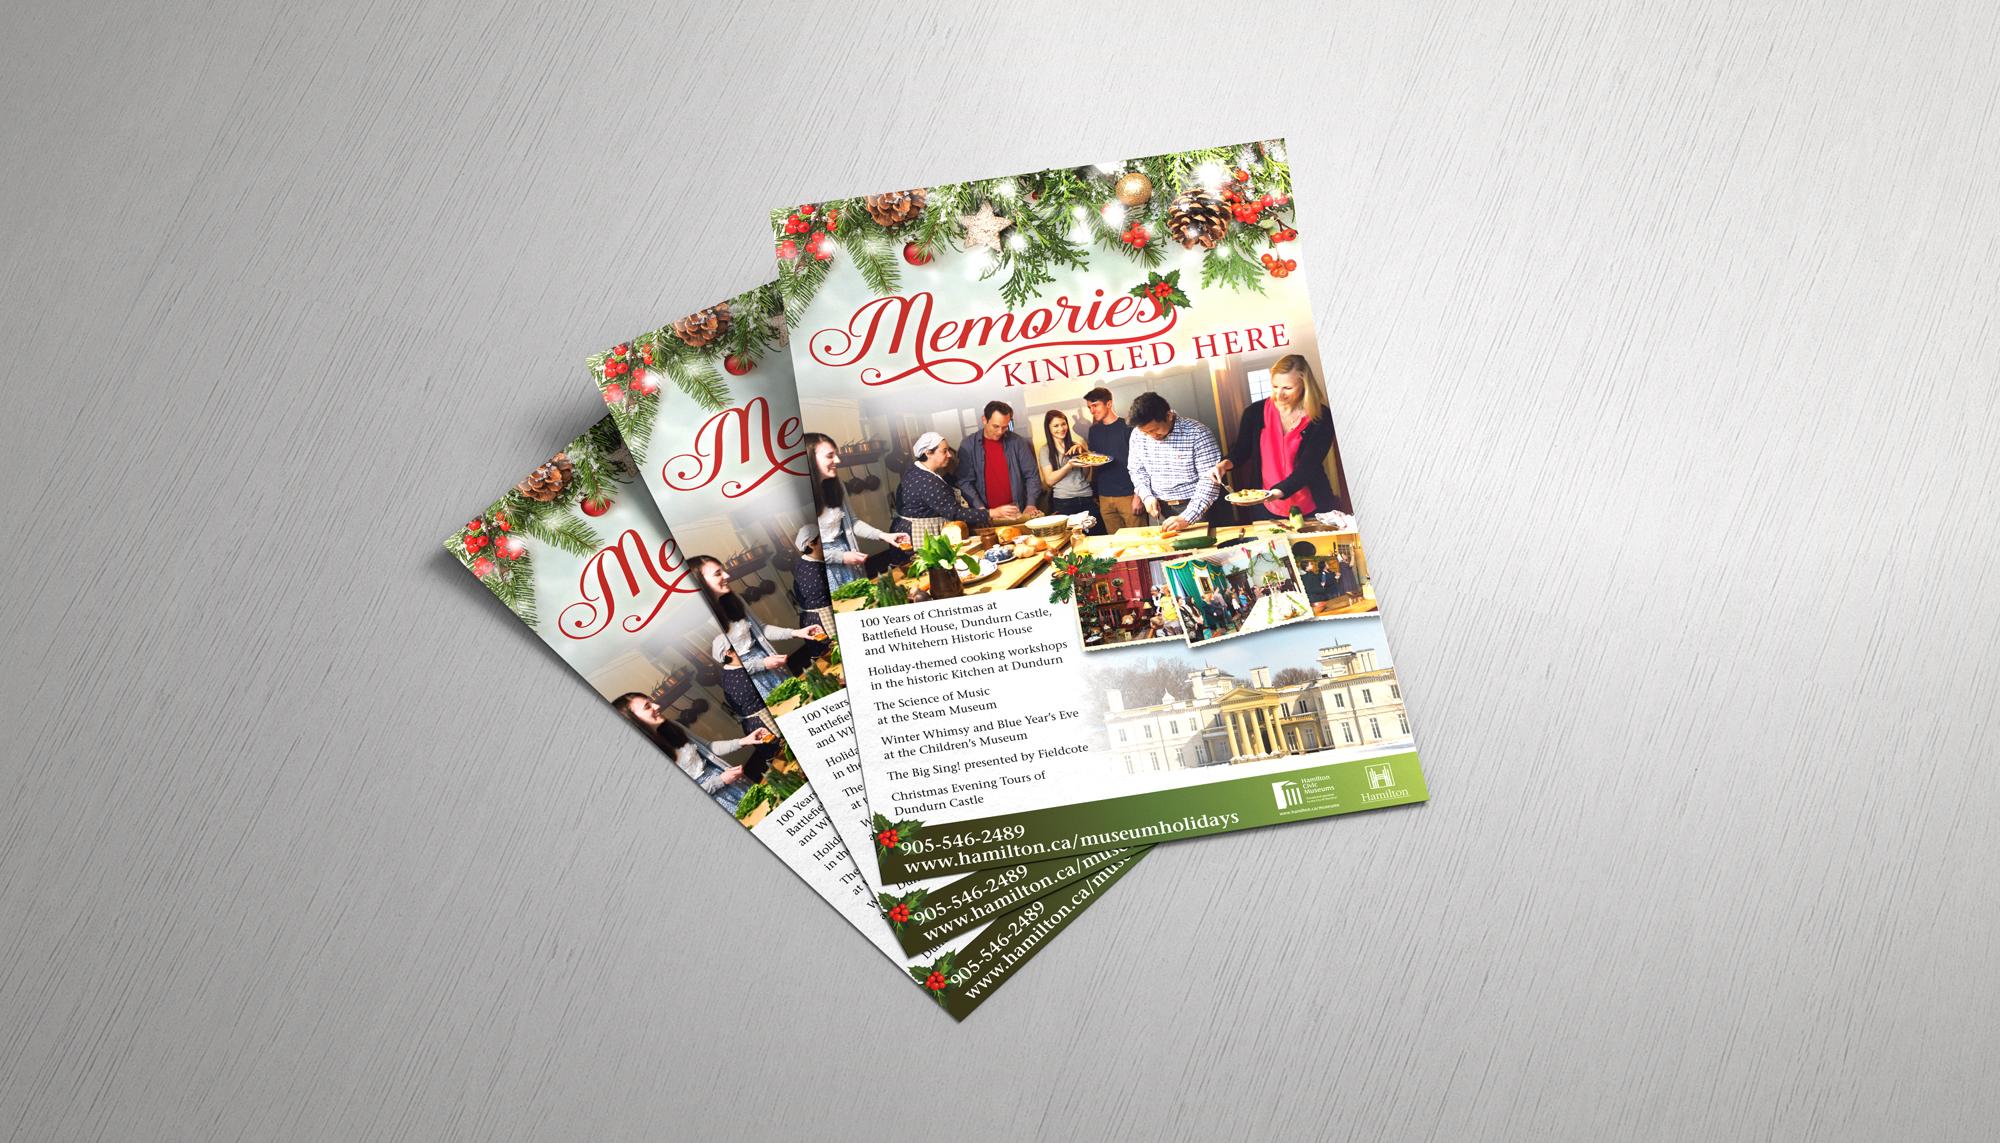 Memories Christmas Poster Design